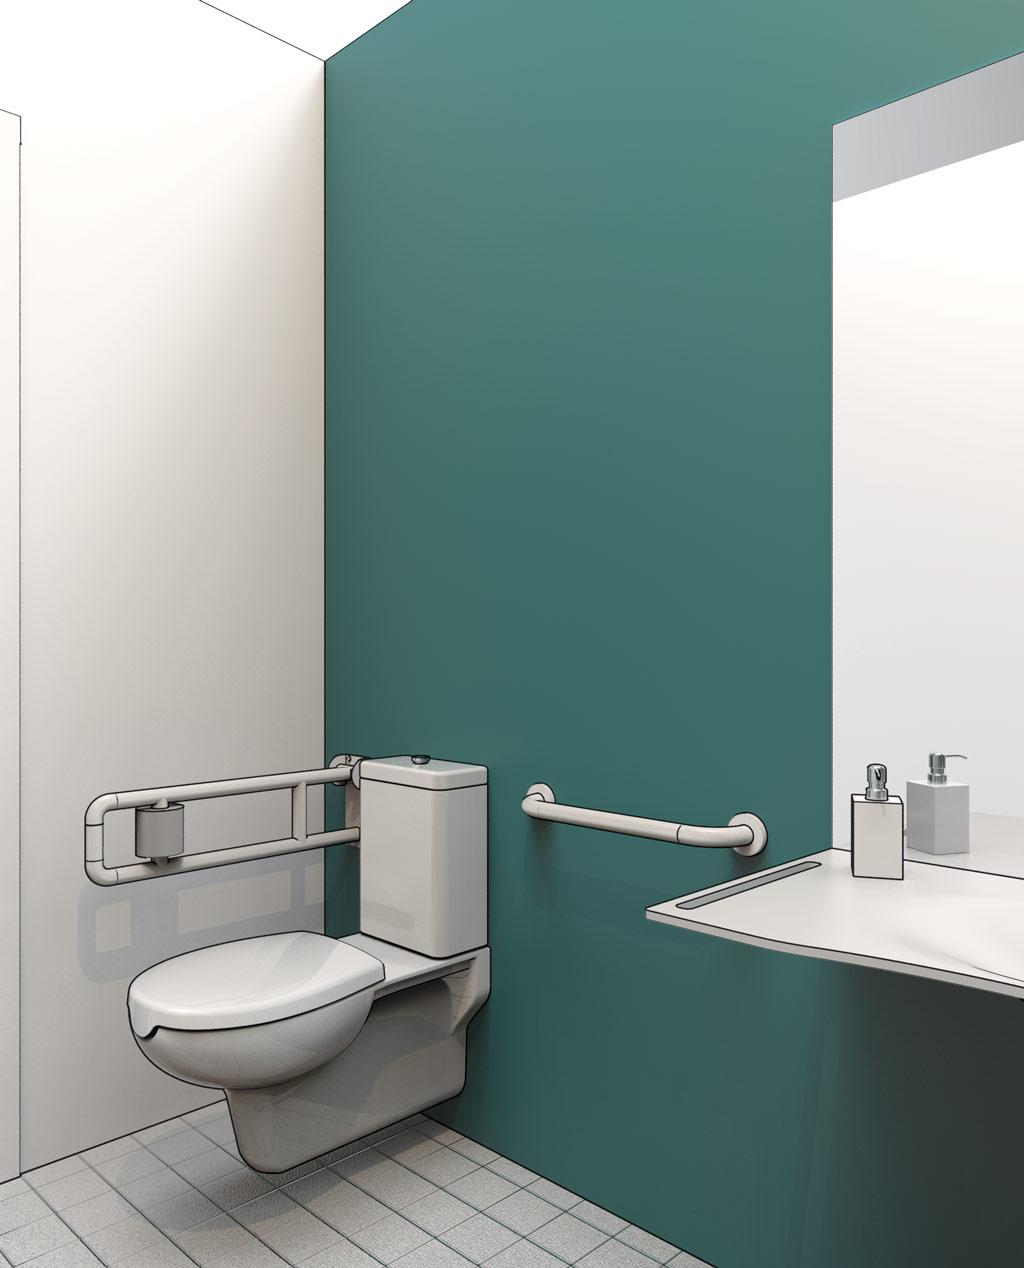 Meuble Salle De Bain Dwg ~ lavabo pmr dwg great salle de bain pmr dwg con dwg lavabo dwg